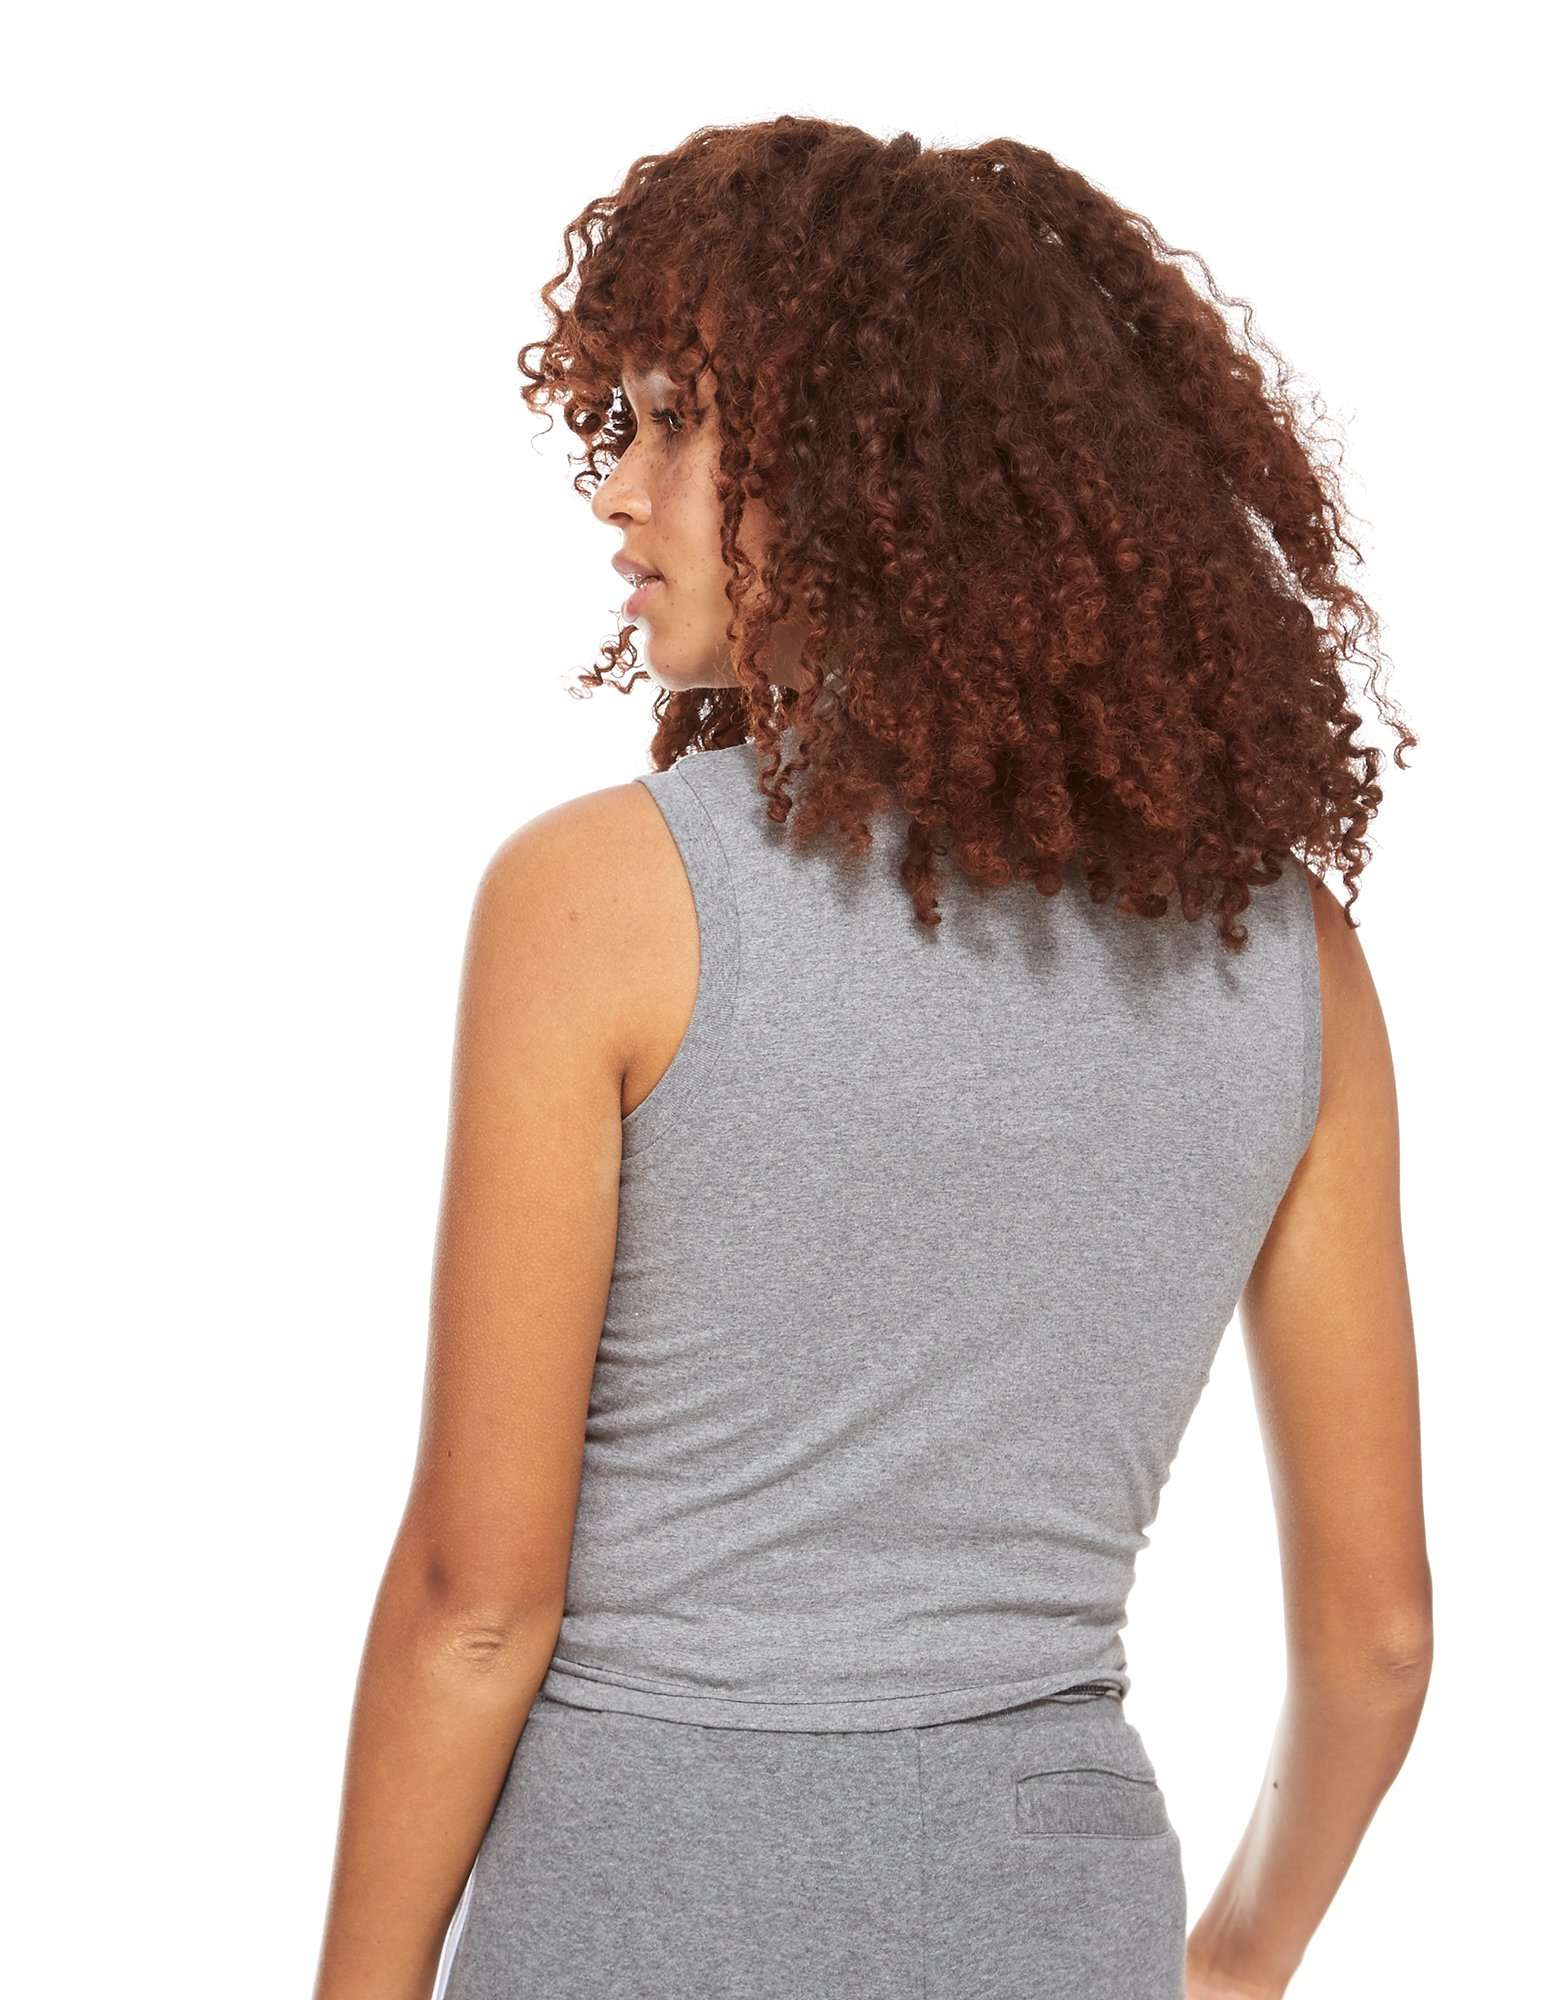 Fila Camiseta corta sin mangas con cremallera